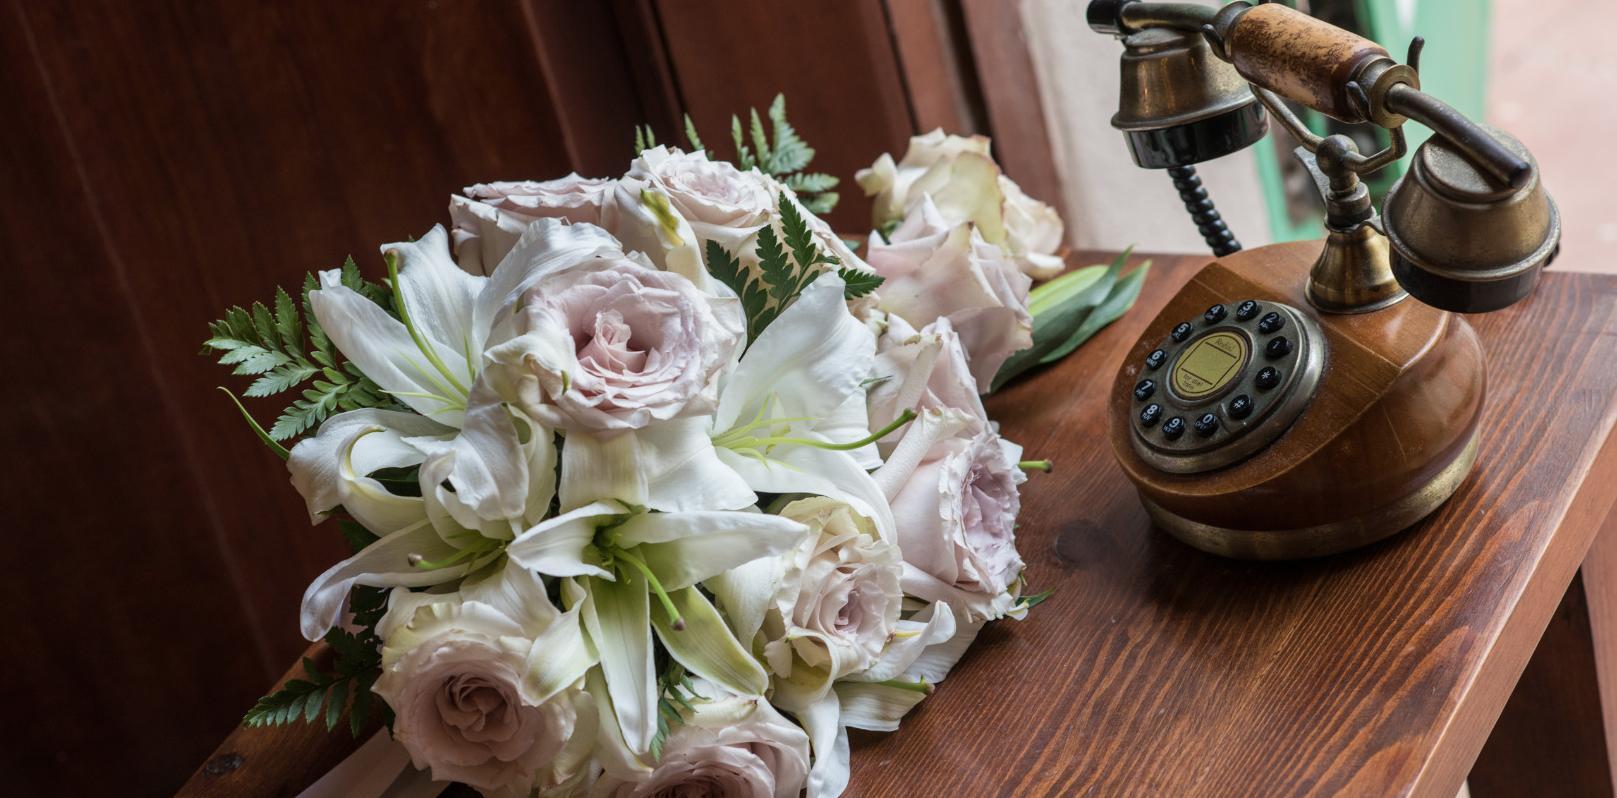 bodas-estilo-clasico-sin-tema-cuba-16504.jpg